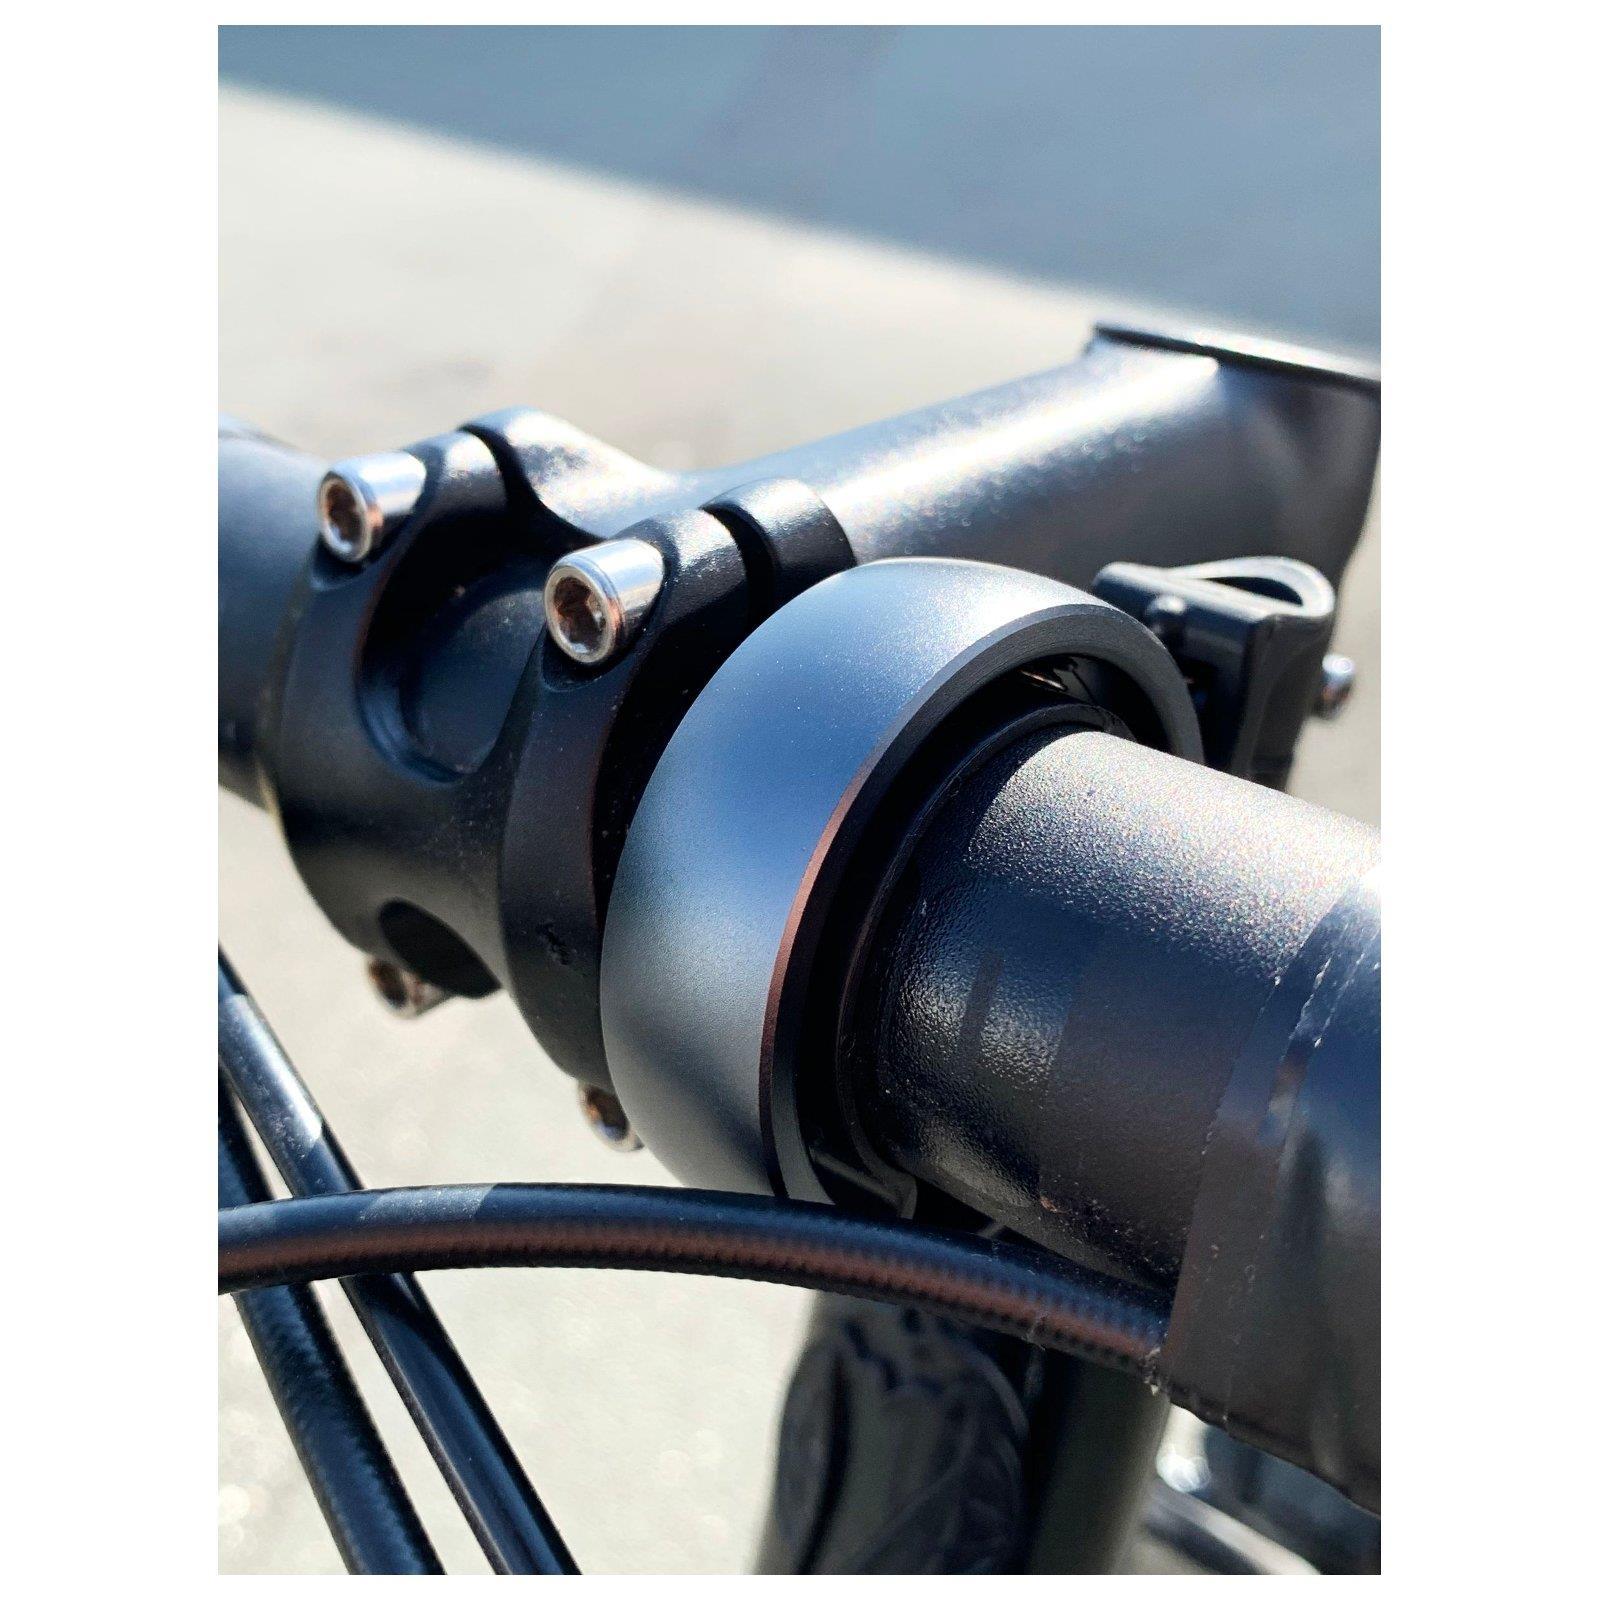 Knog Oi Classic Groß Fahrrad Klingel 23,8-31,8mm Bike Bell Glocke Design Slim